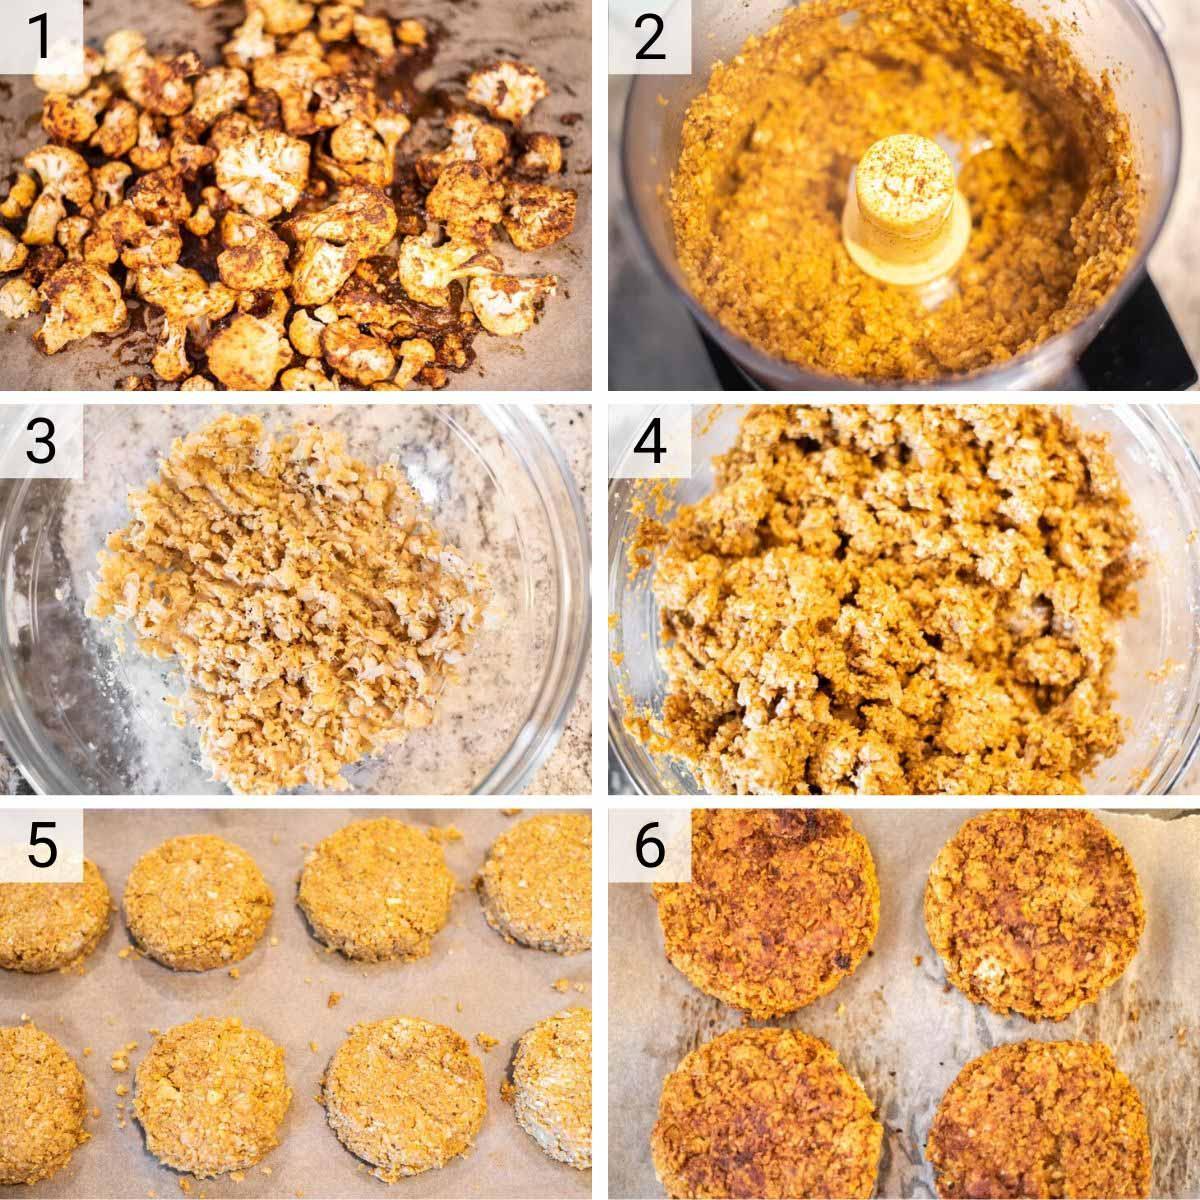 process shots of how to make cauliflower burgers